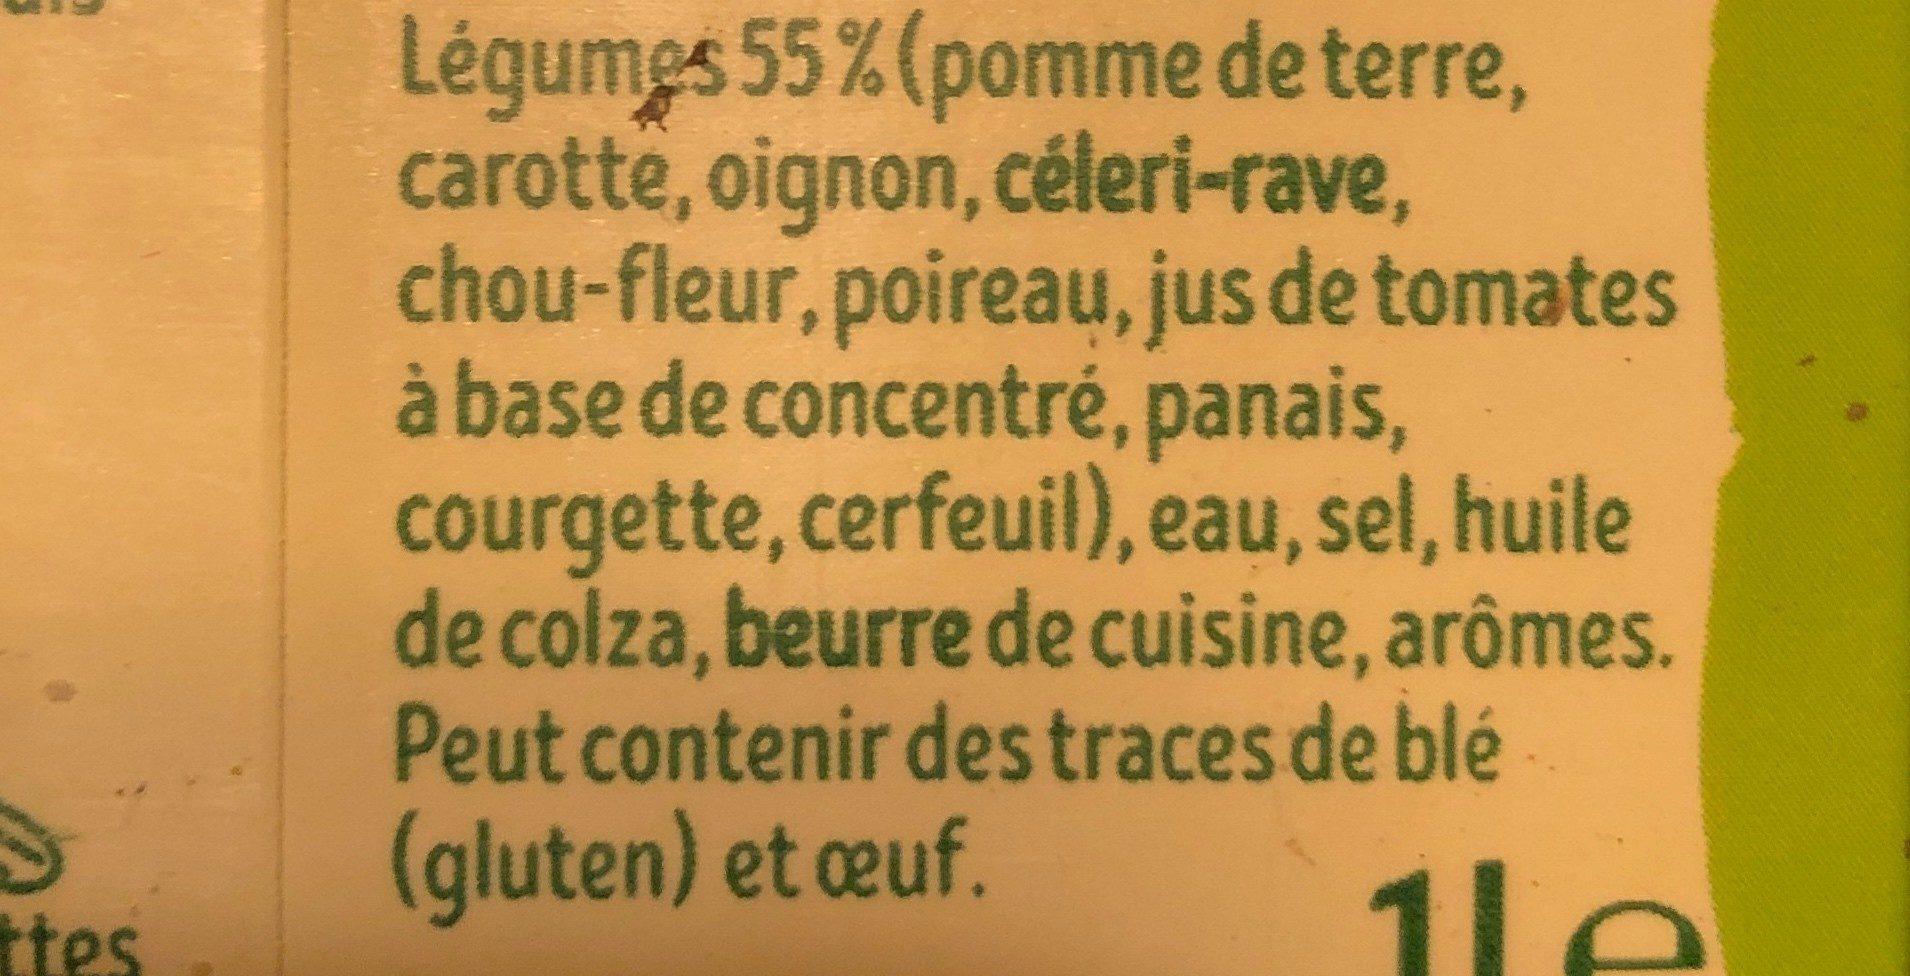 Mouliné de 10 légumes - Ingrediënten